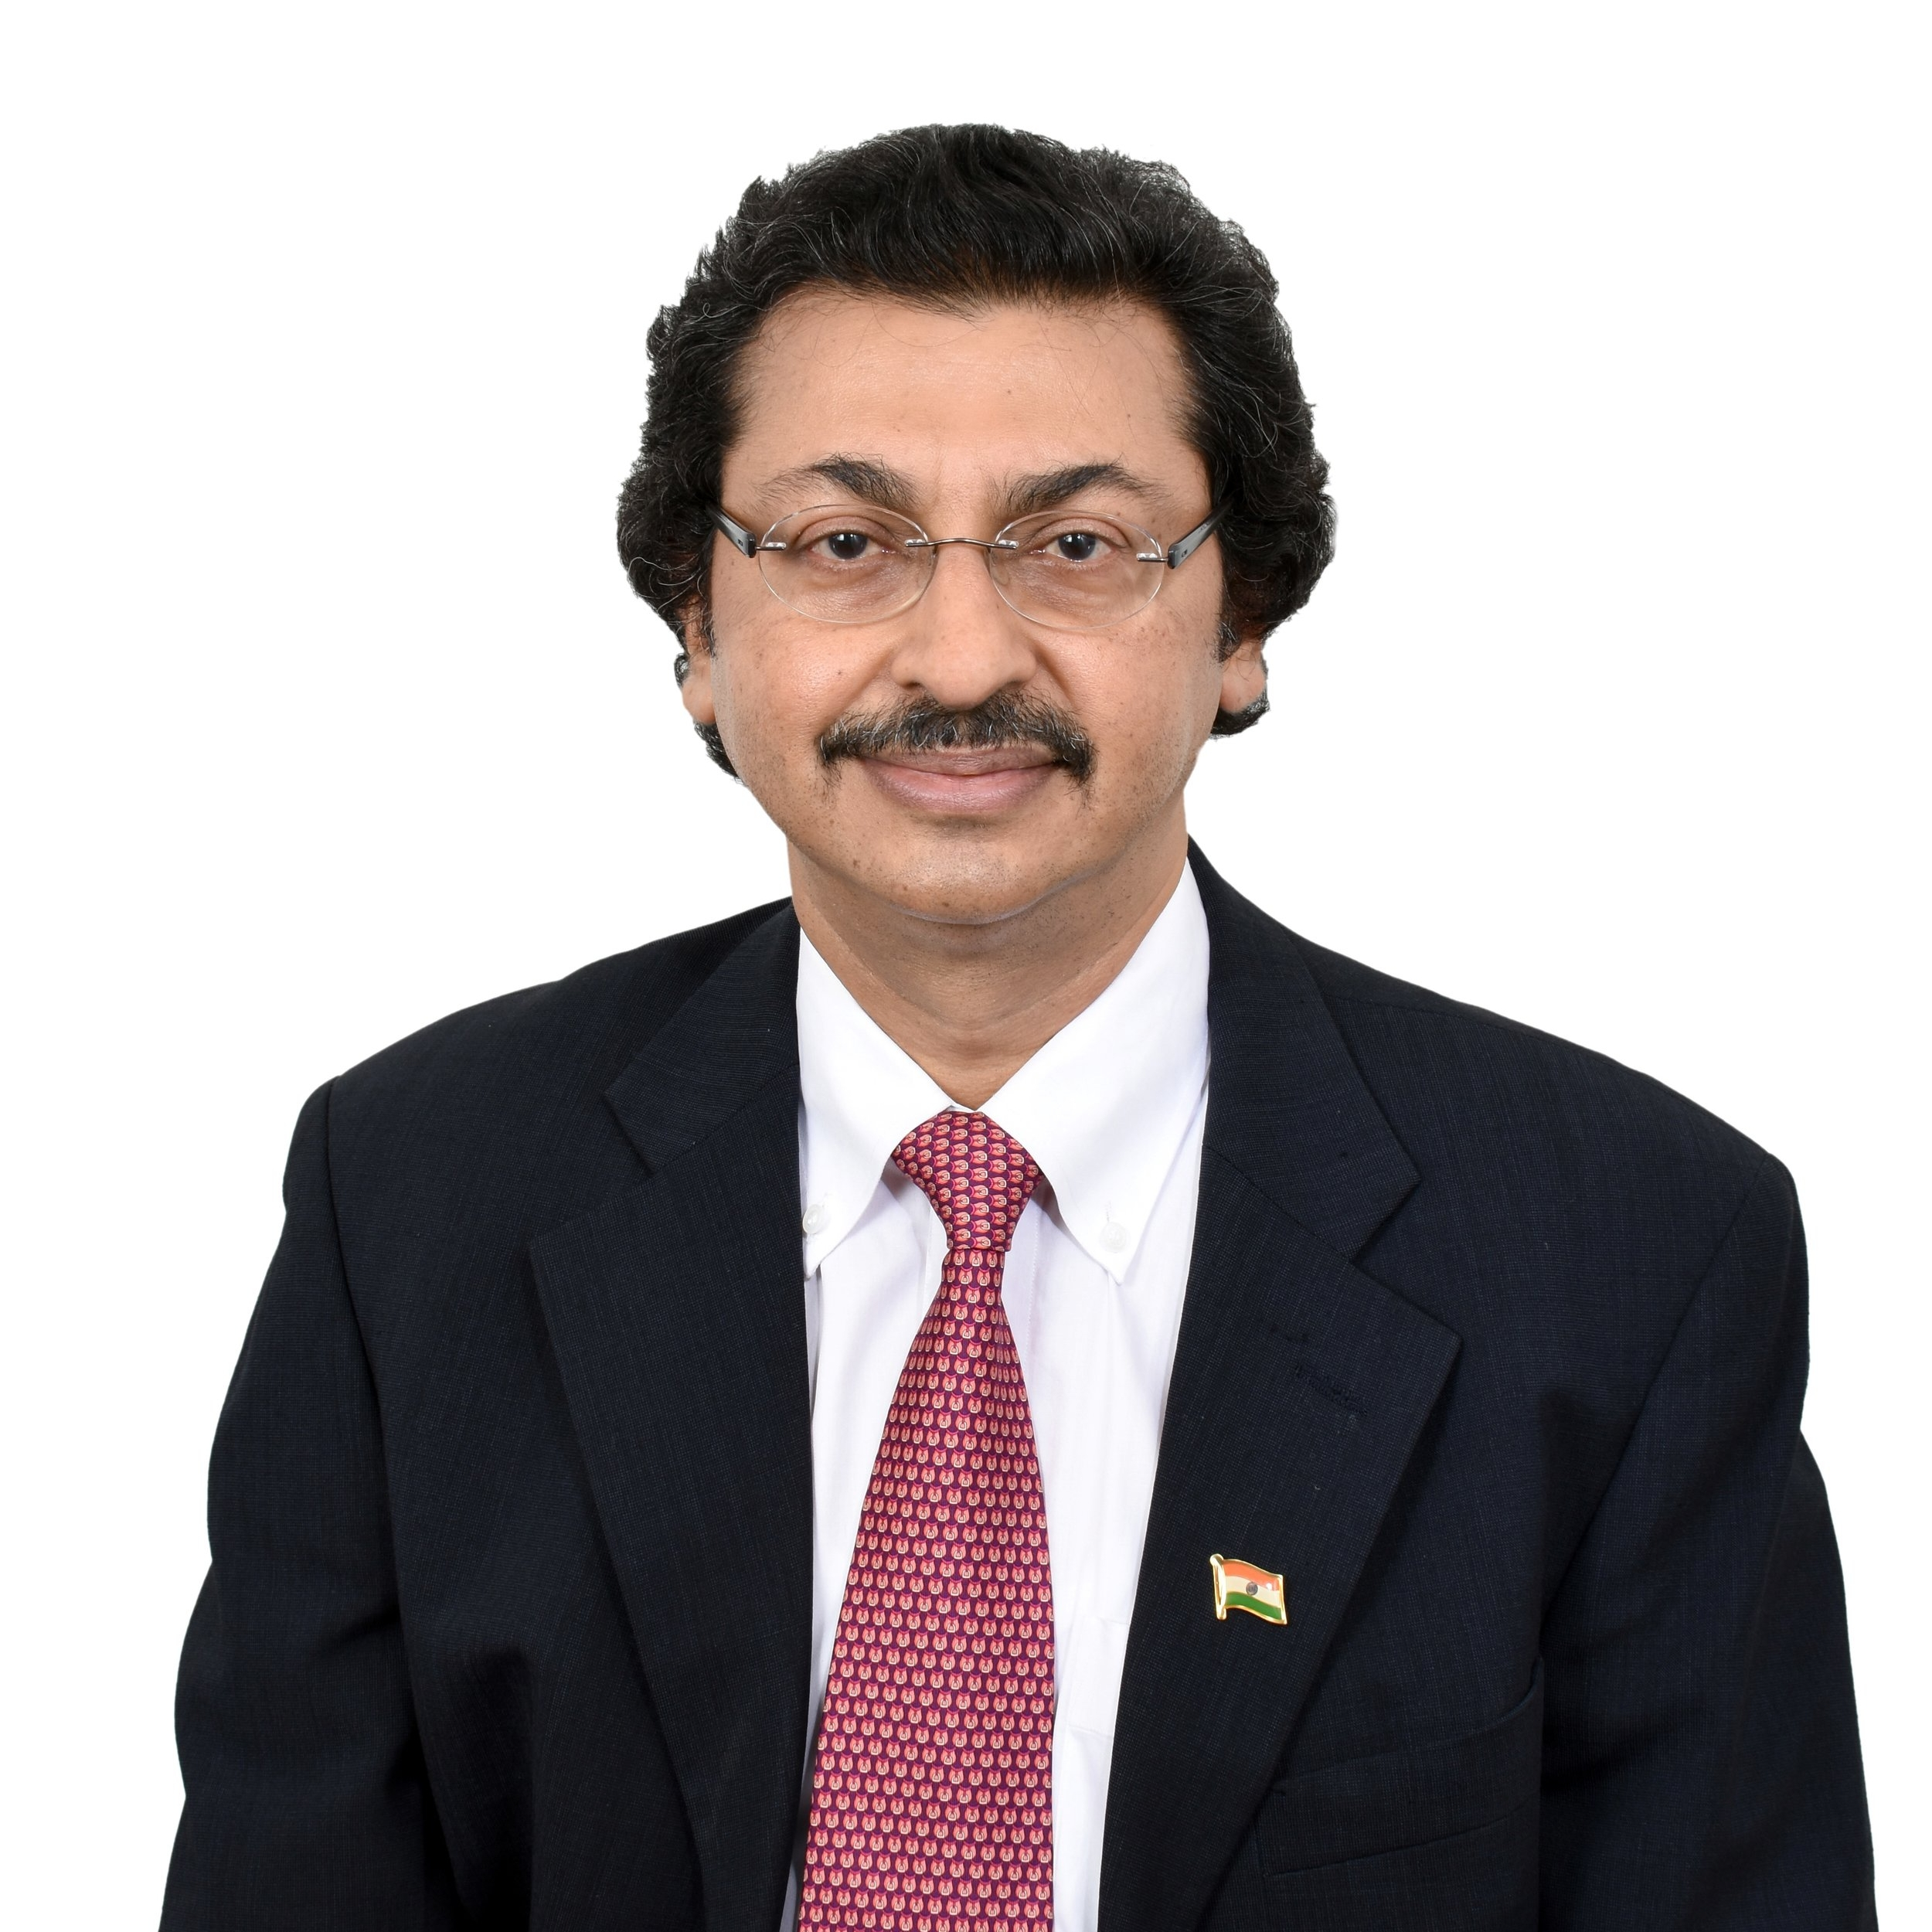 Mr Gautam N. MehraCHAIRMAN - Chairman & Managing Director - Savita Oil Technologies Limited, Mumbai, India